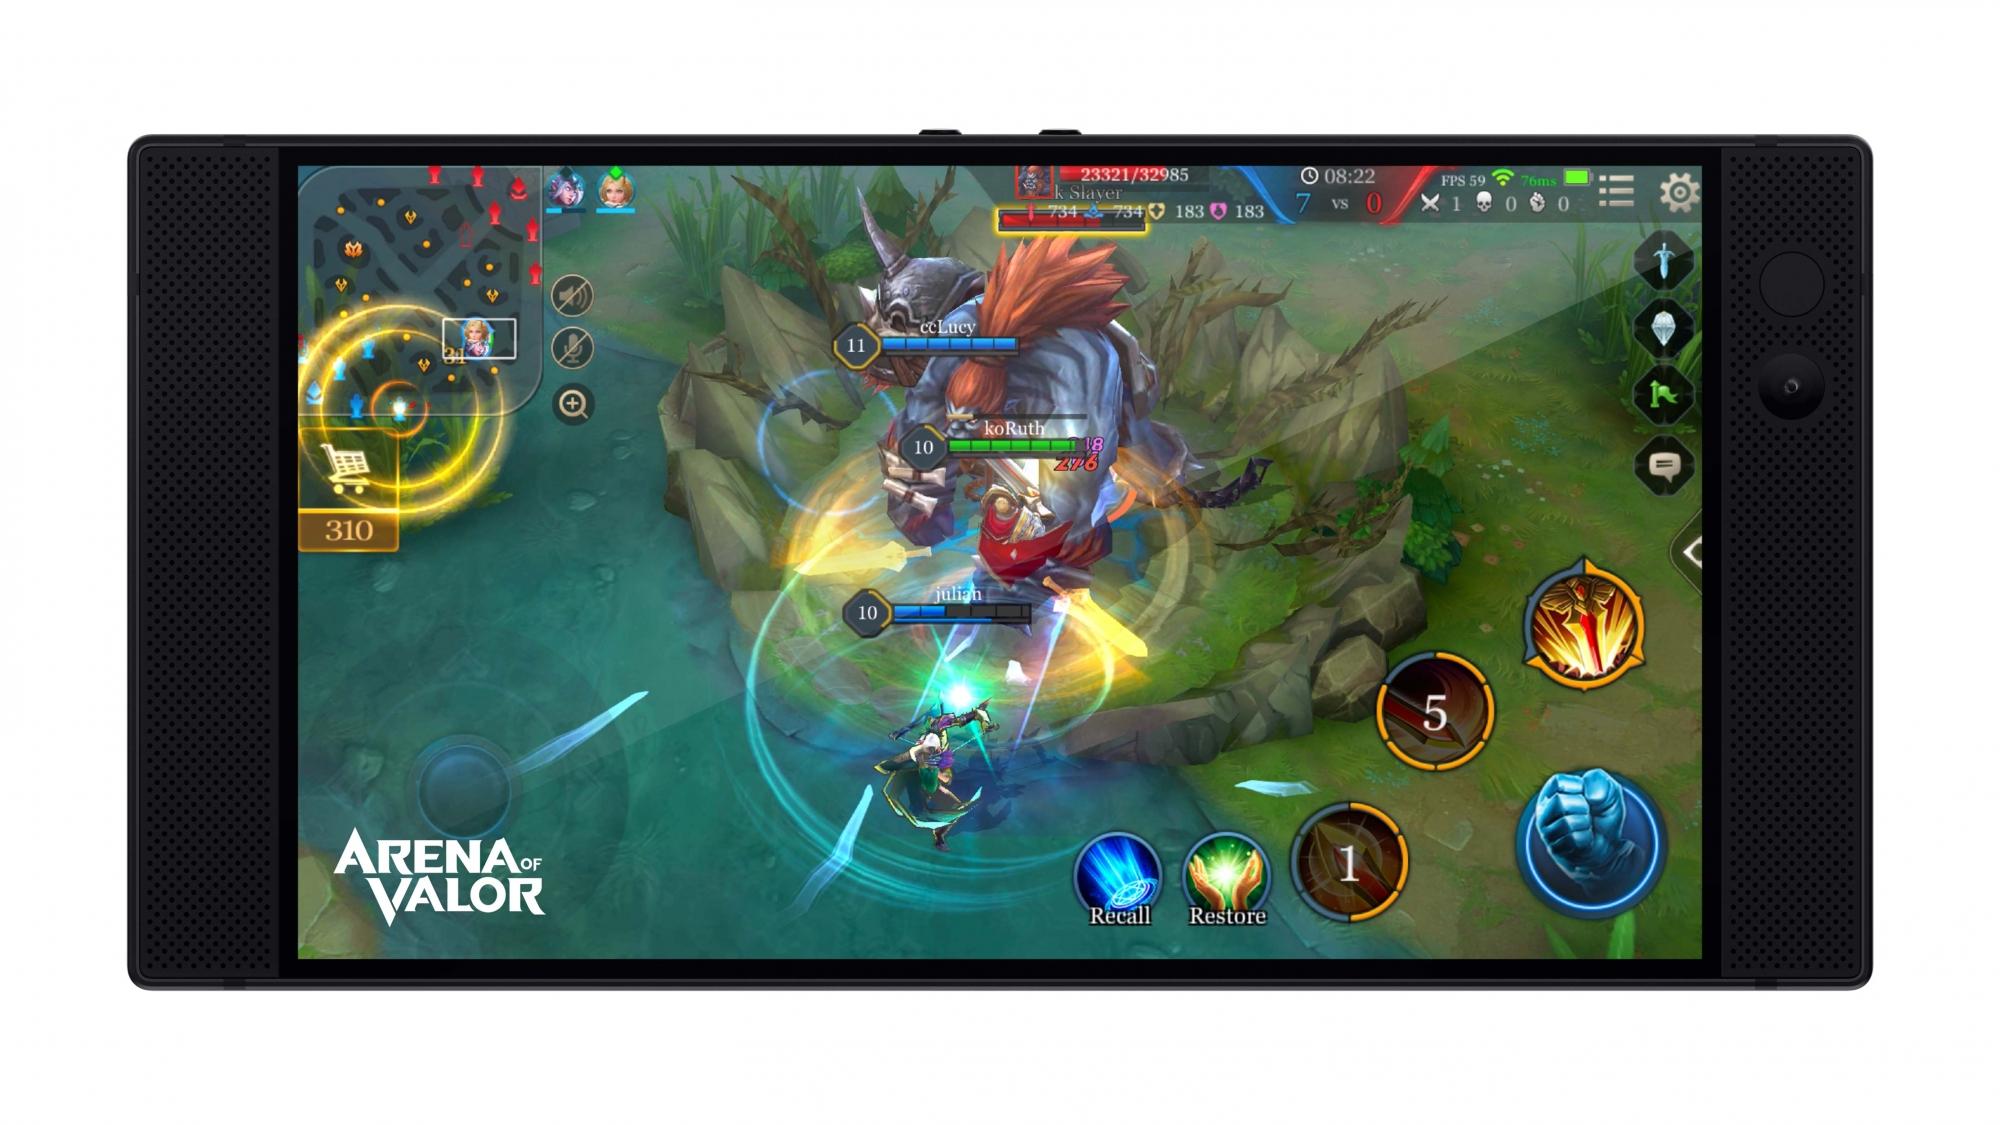 Razer-Phone-Games-Arena-of-Valor-02